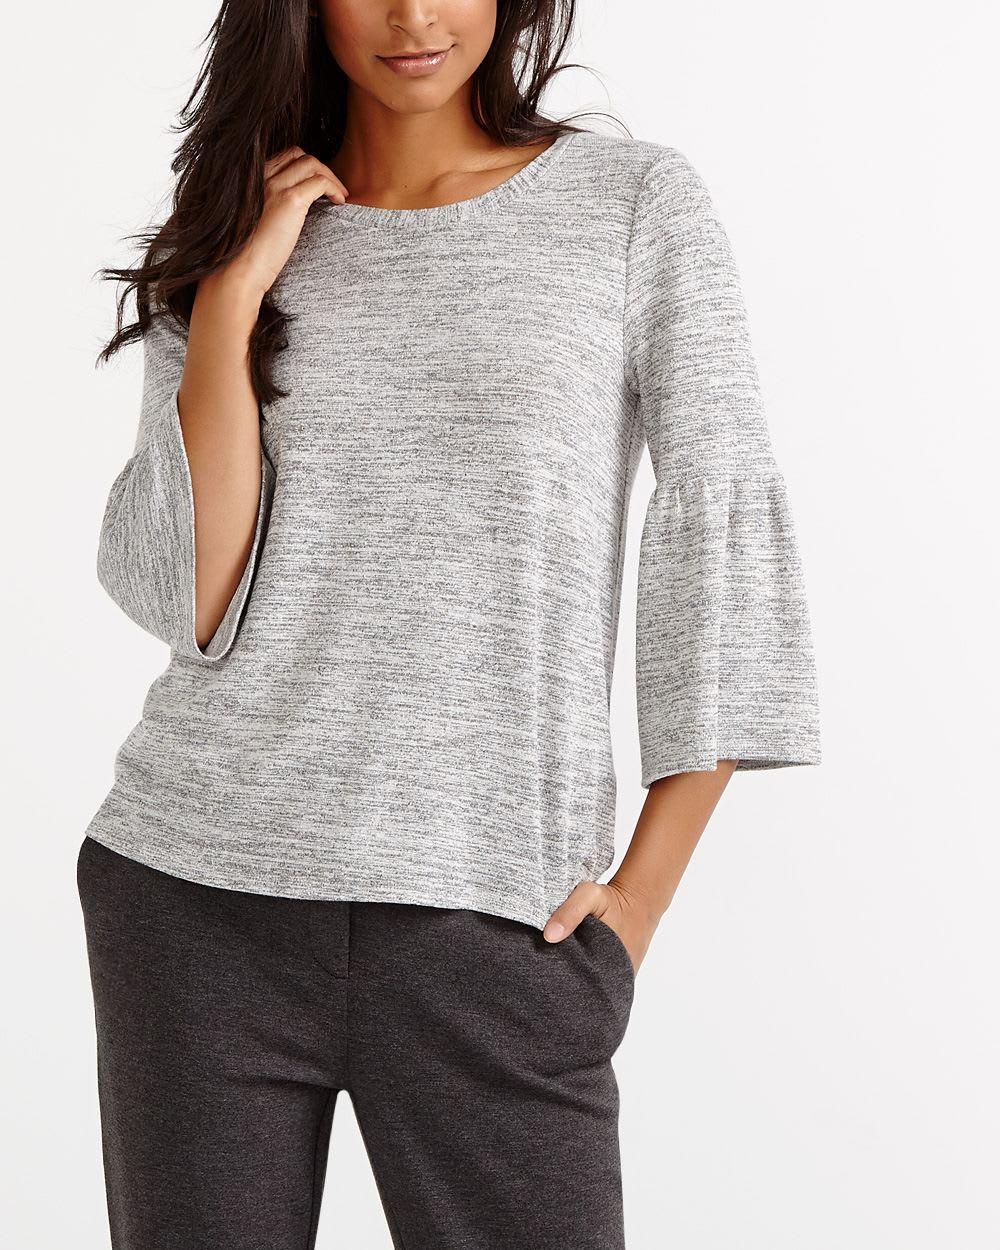 Bell sleeve t shirt women reitmans for Bell bottom sleeve shirt